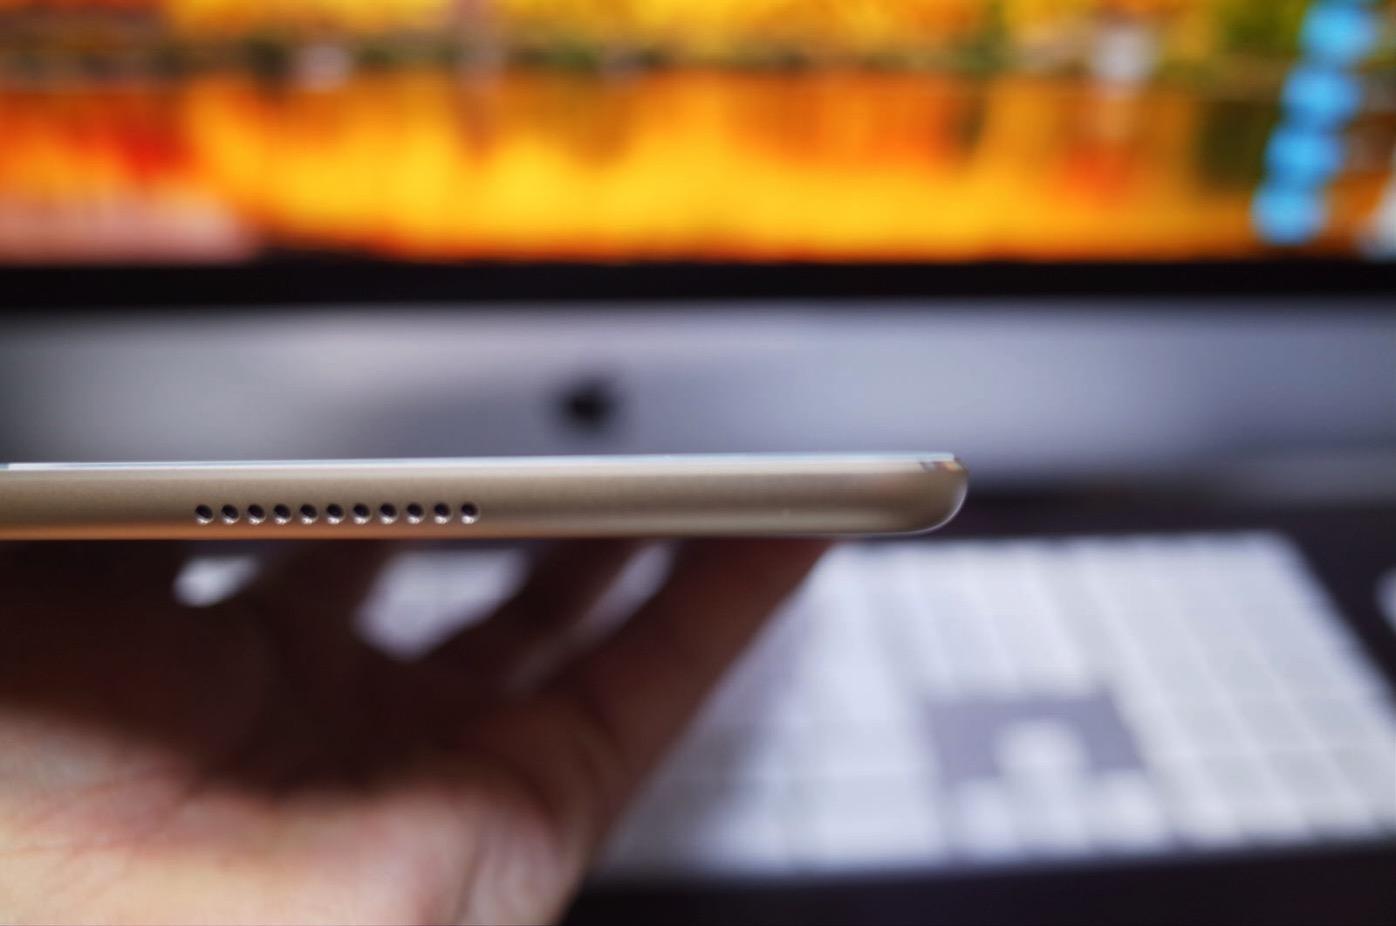 Nimaso iPad Pro 10.5 専用 フィルム 【 日本製素材旭硝子製 】 強化ガラス-7